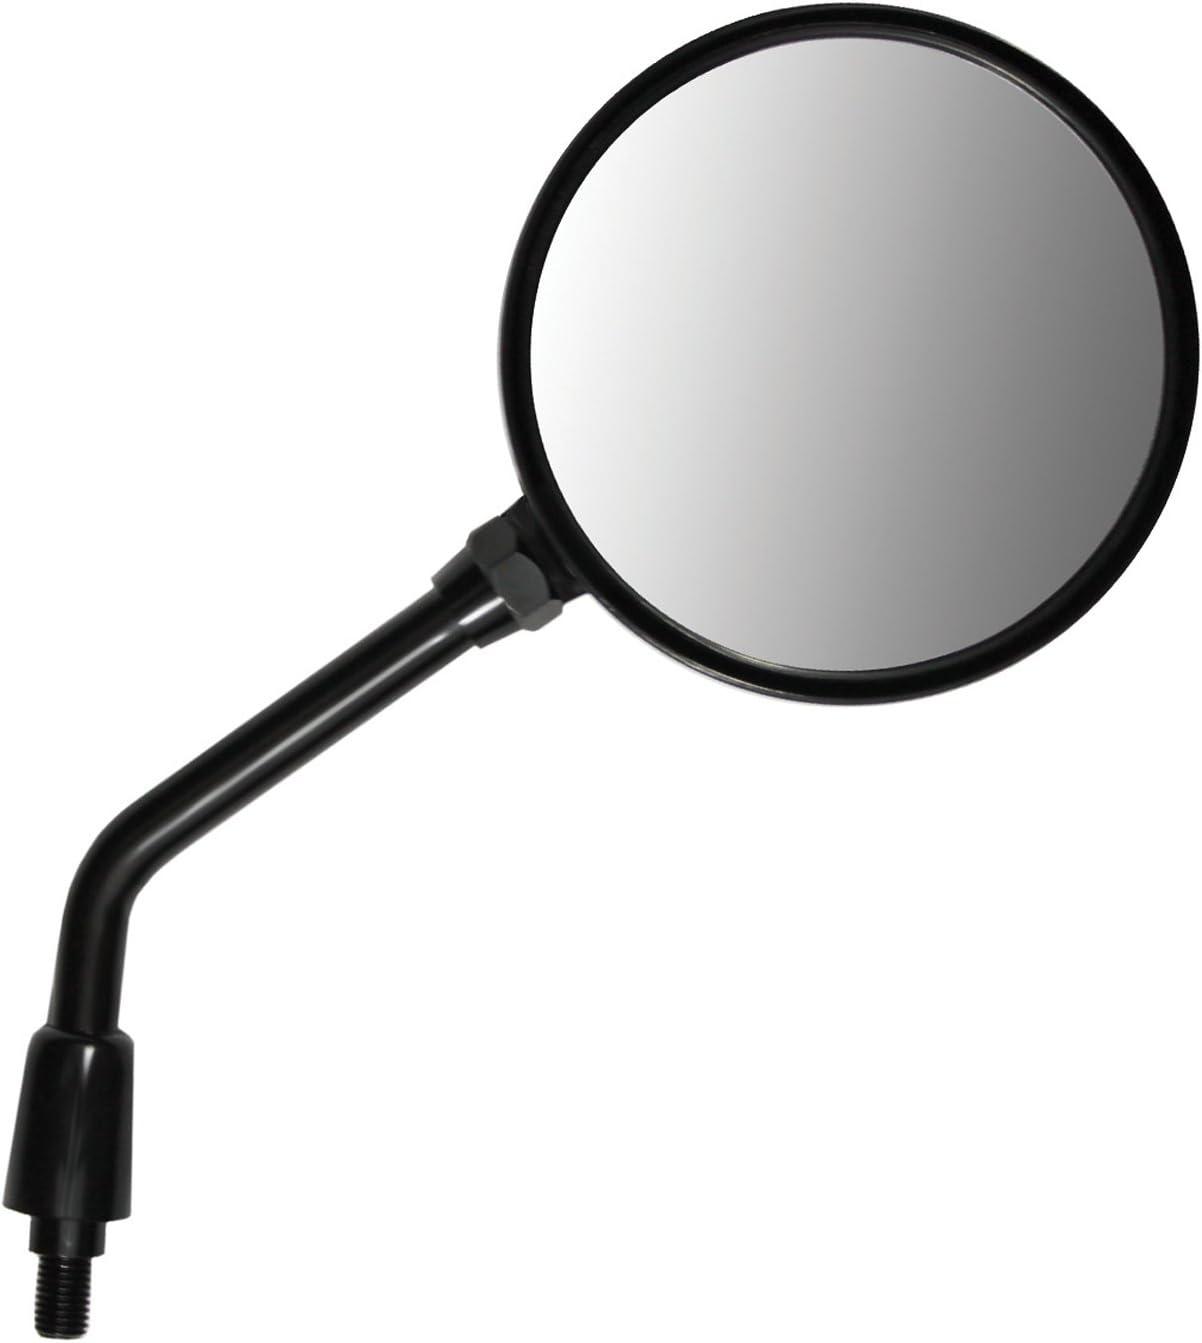 Poweka 95107 Black Knockback Stem Round Motorcycle Mirror RH//LH,EC Spec